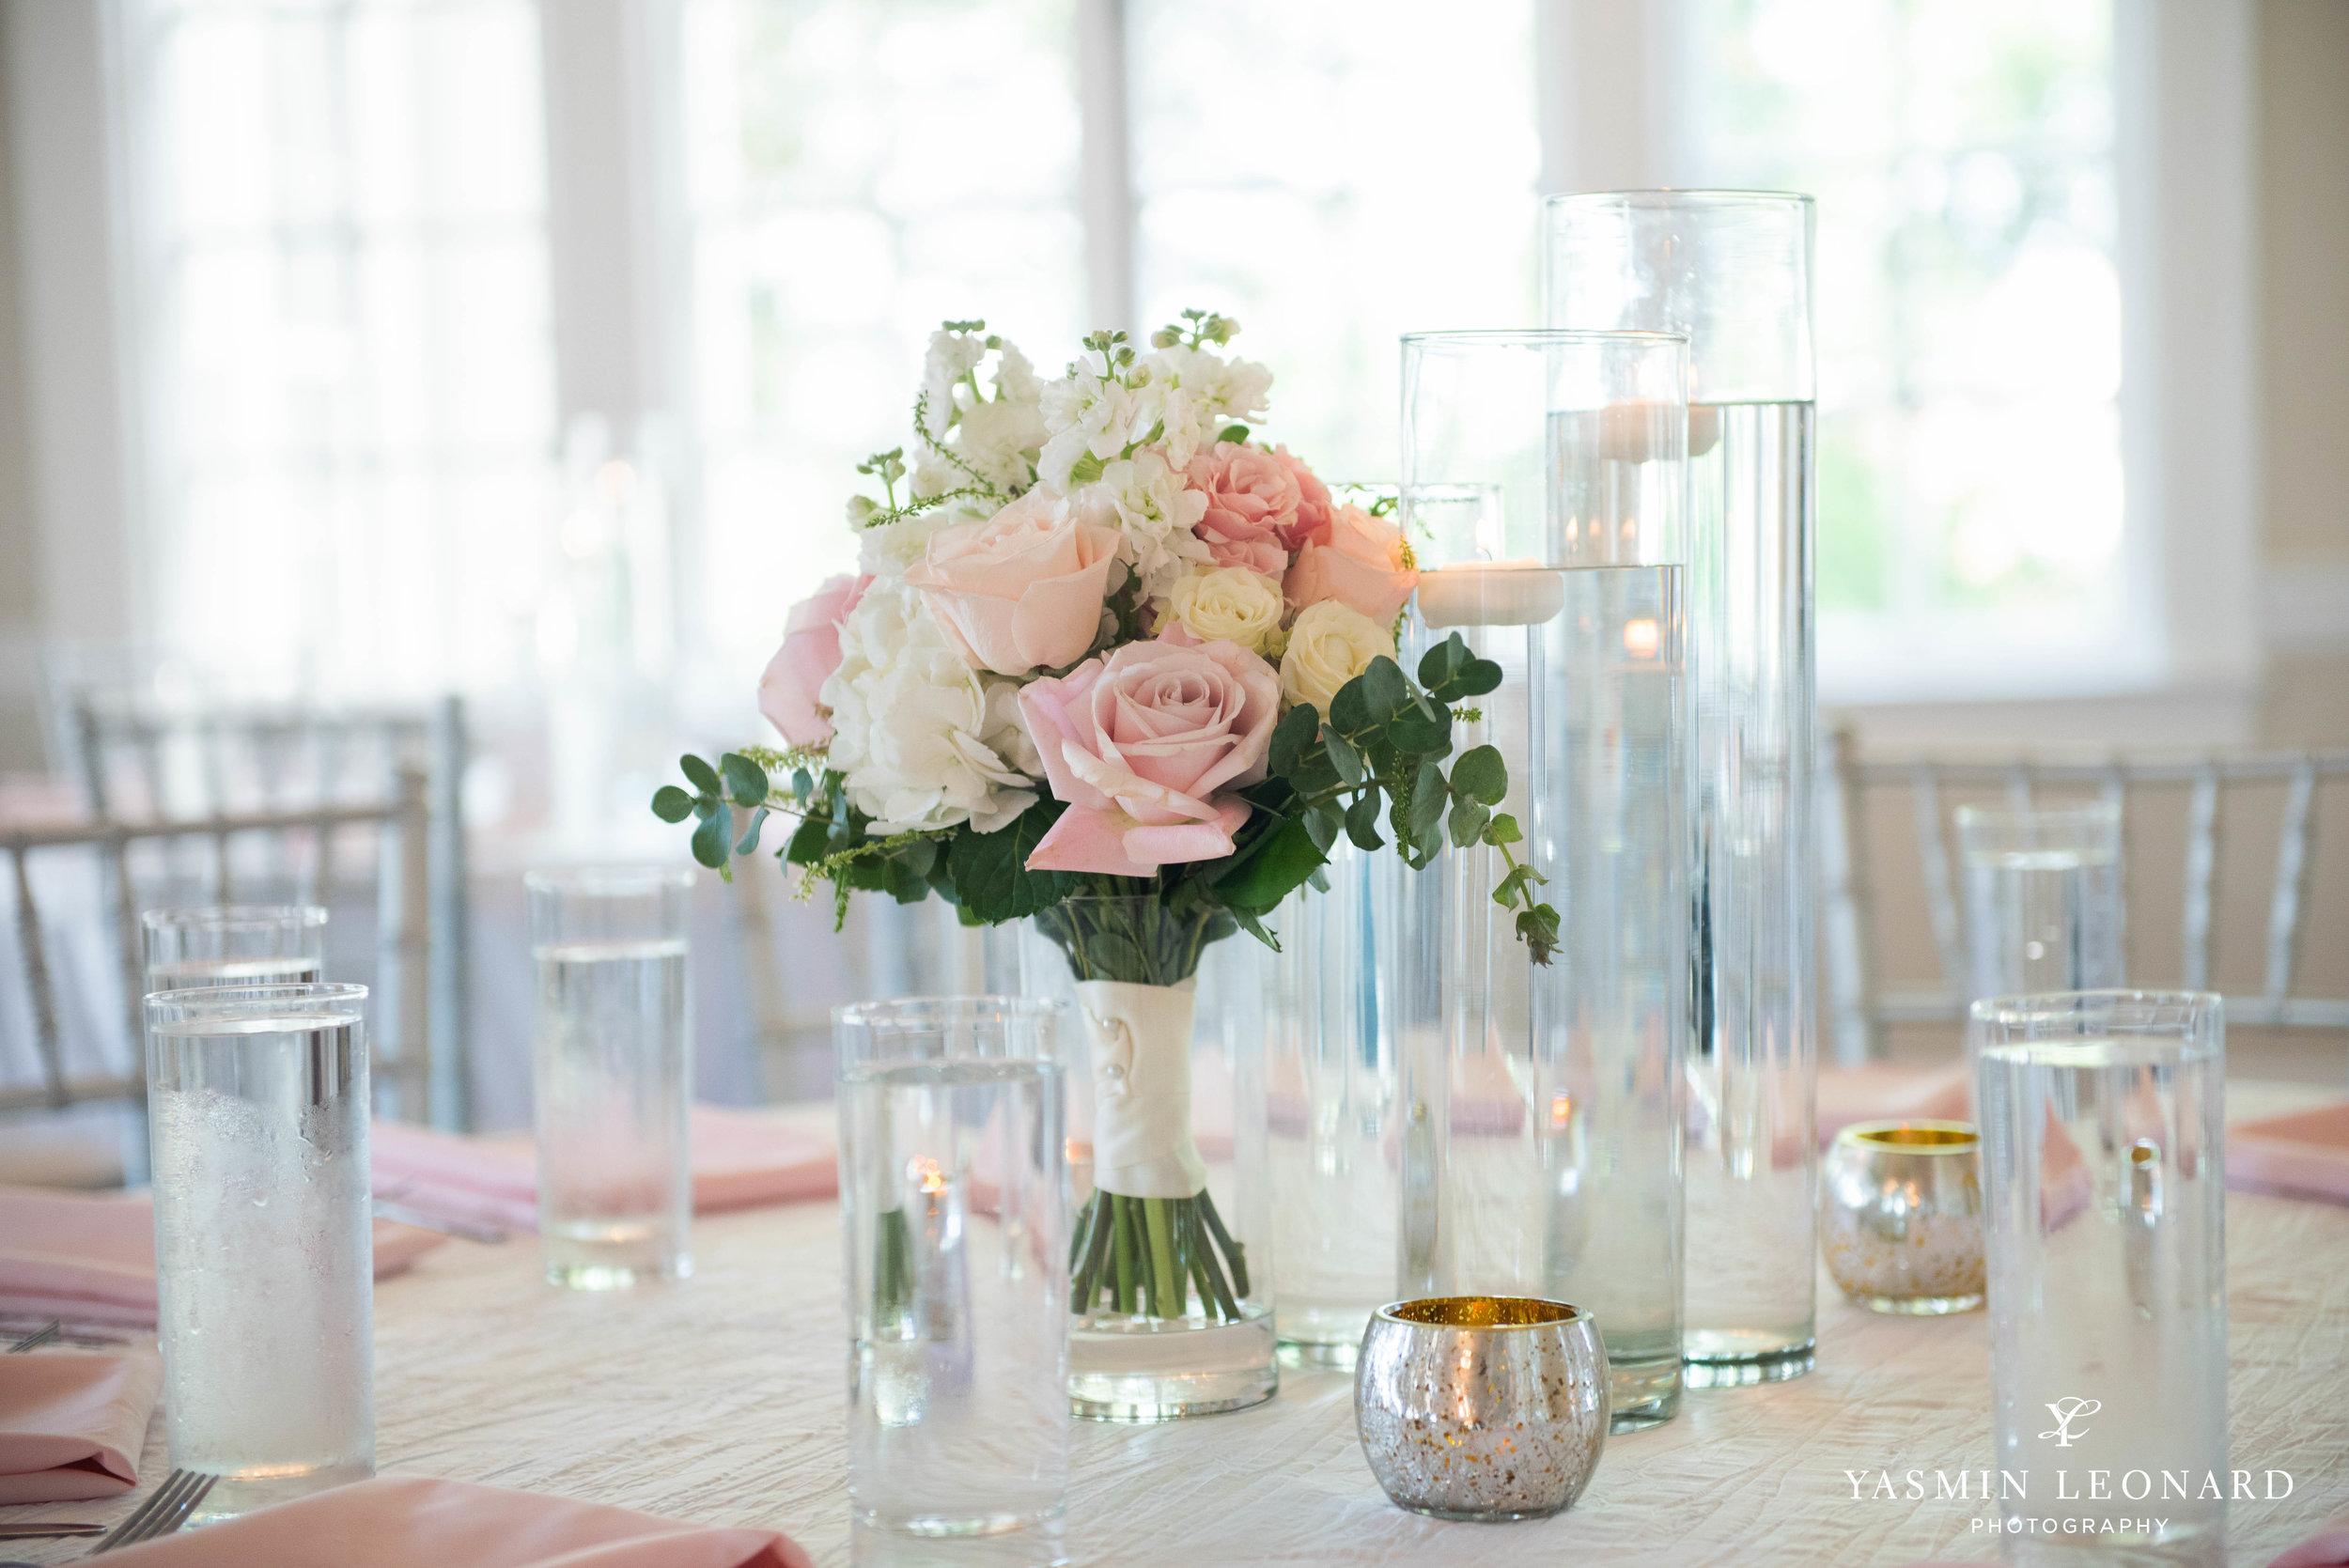 Separk Mansion - NC Weddings - Gastonia Wedding - NC Wedding Venues - Pink and Blue Wedding Ideas - Pink Bridesmaid Dresses - Yasmin Leonard Photography-43.jpg